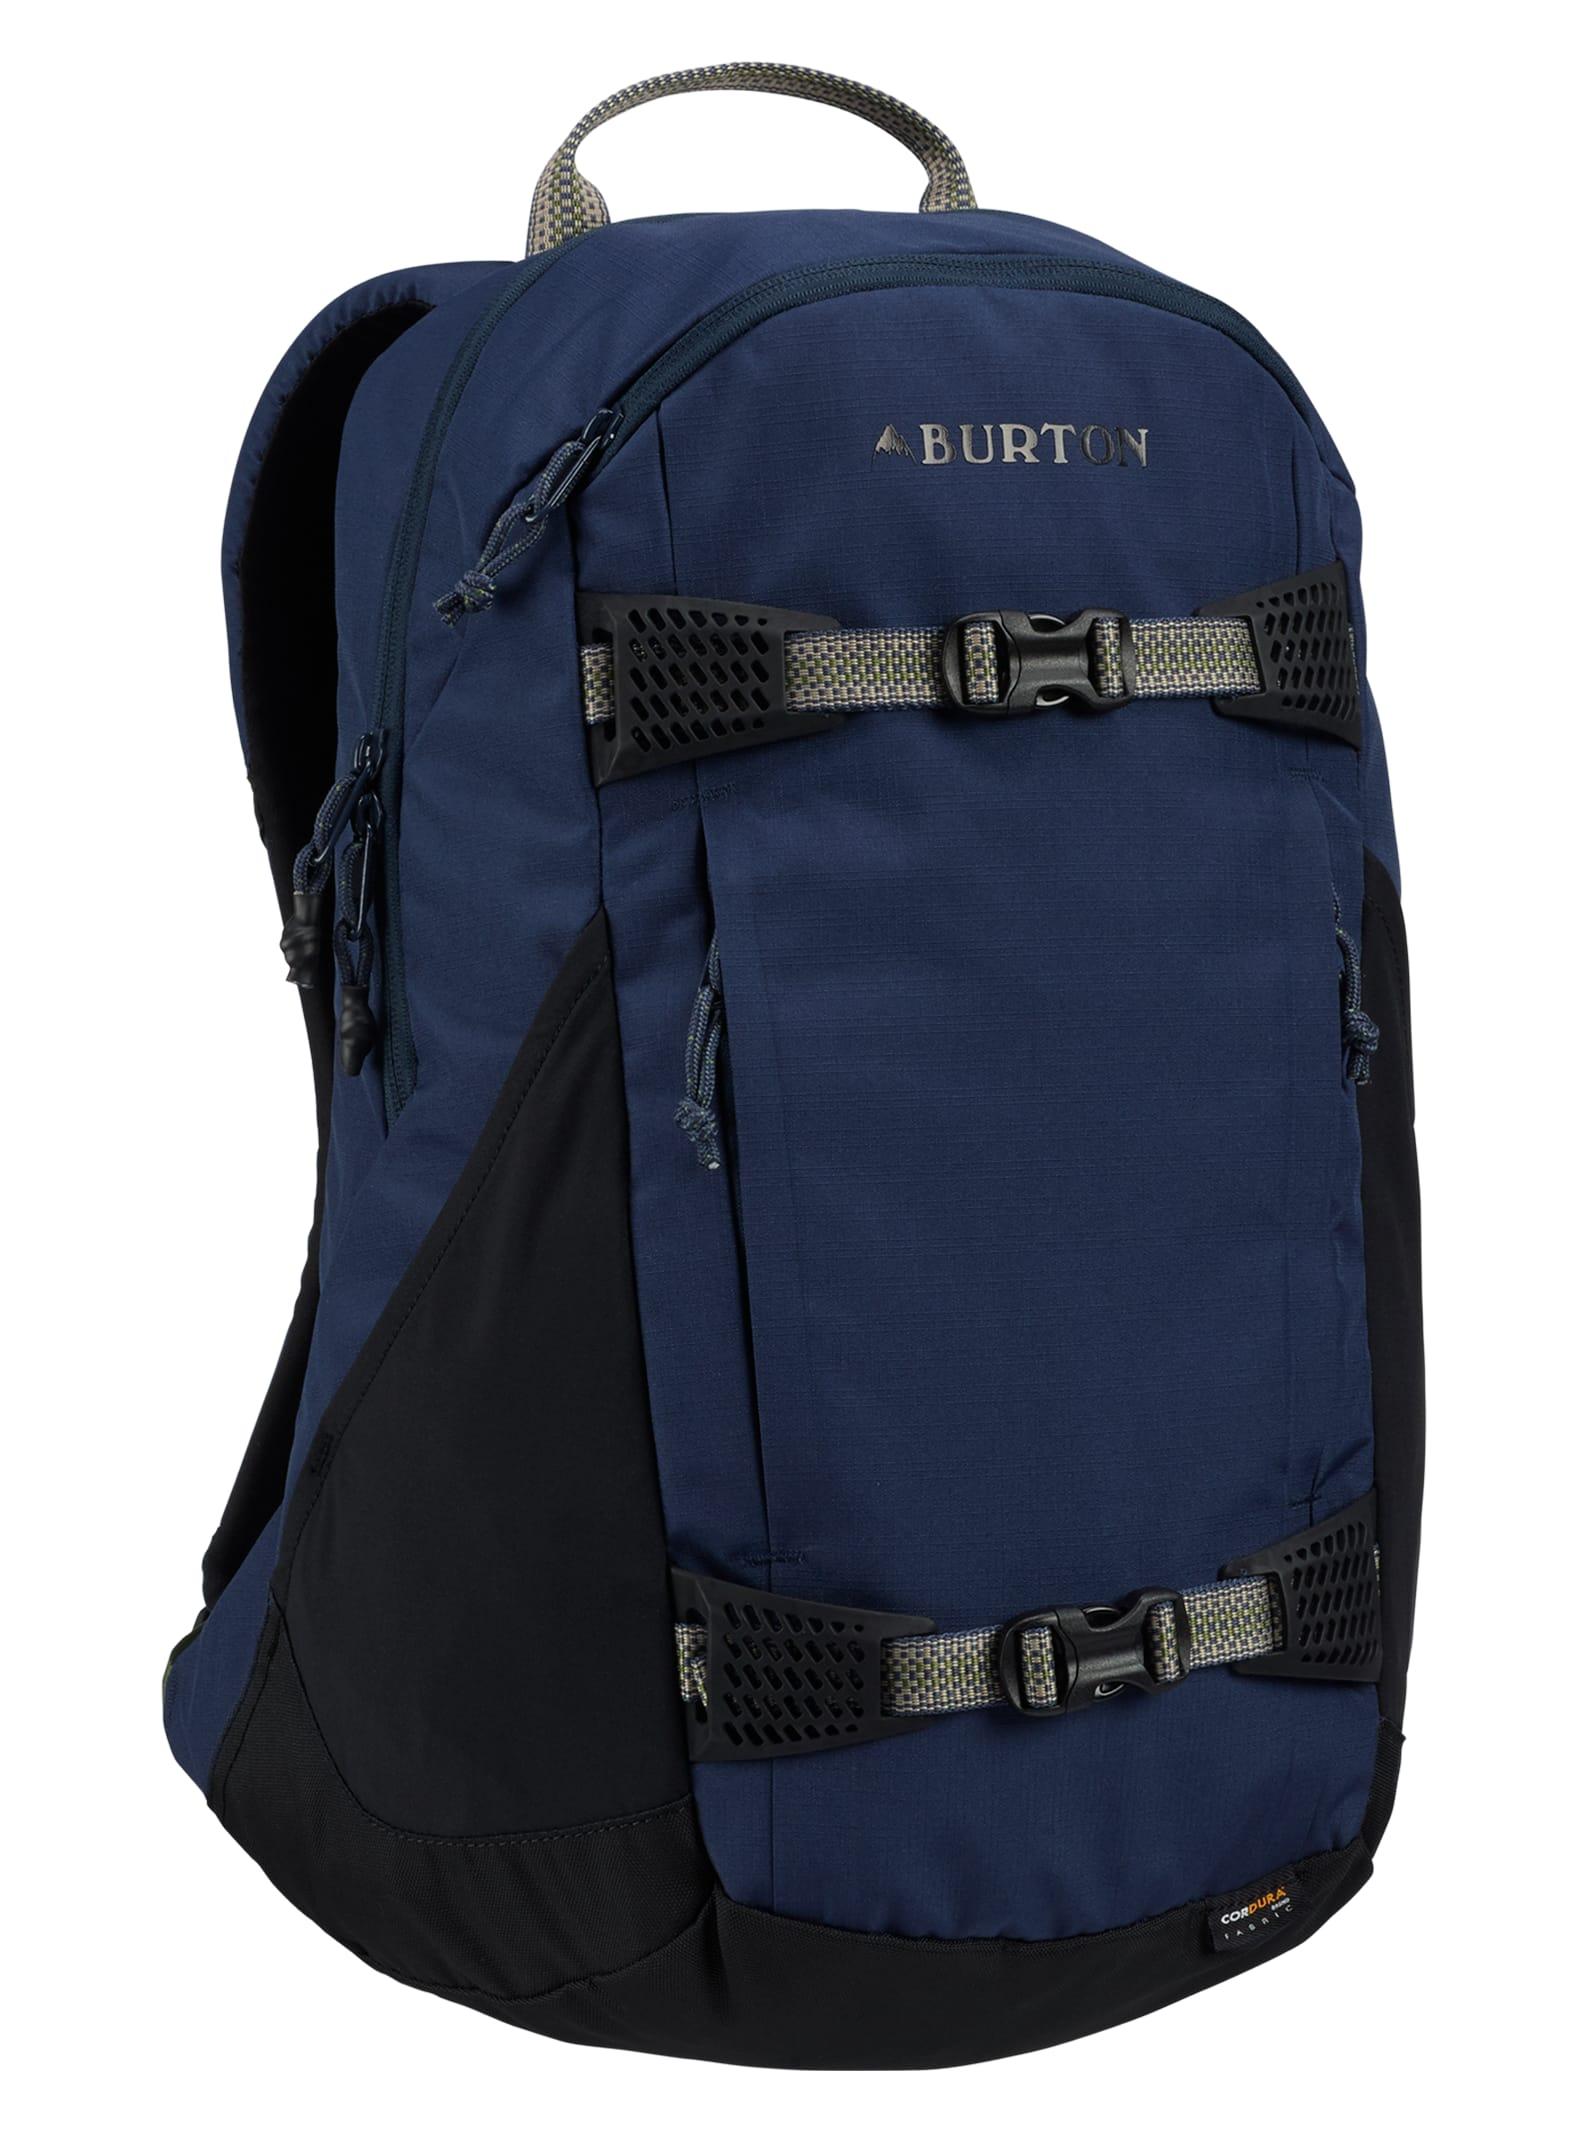 50a94c1ff7b10 Burton Day Hiker 25L Backpack